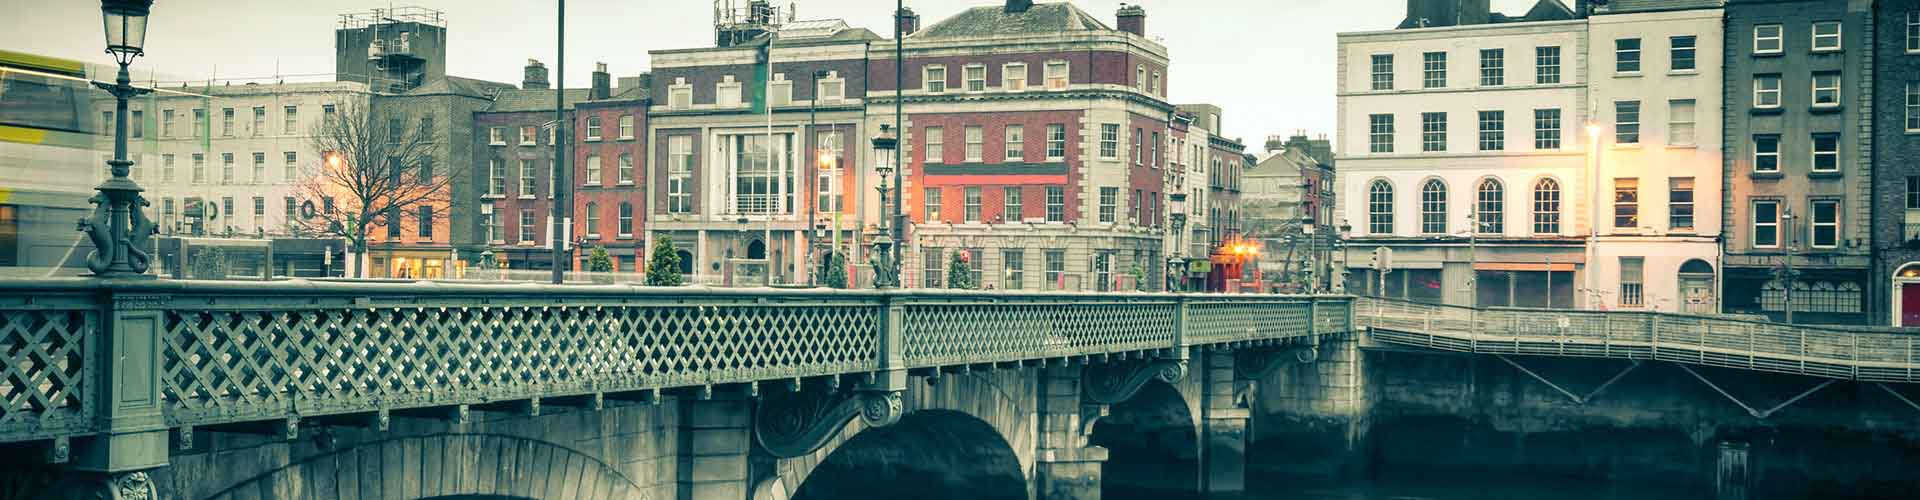 Dublin - apartmány v Dublin. Mapy pro Dublin, fotky a recenze pro každý apartmán - Dublin.